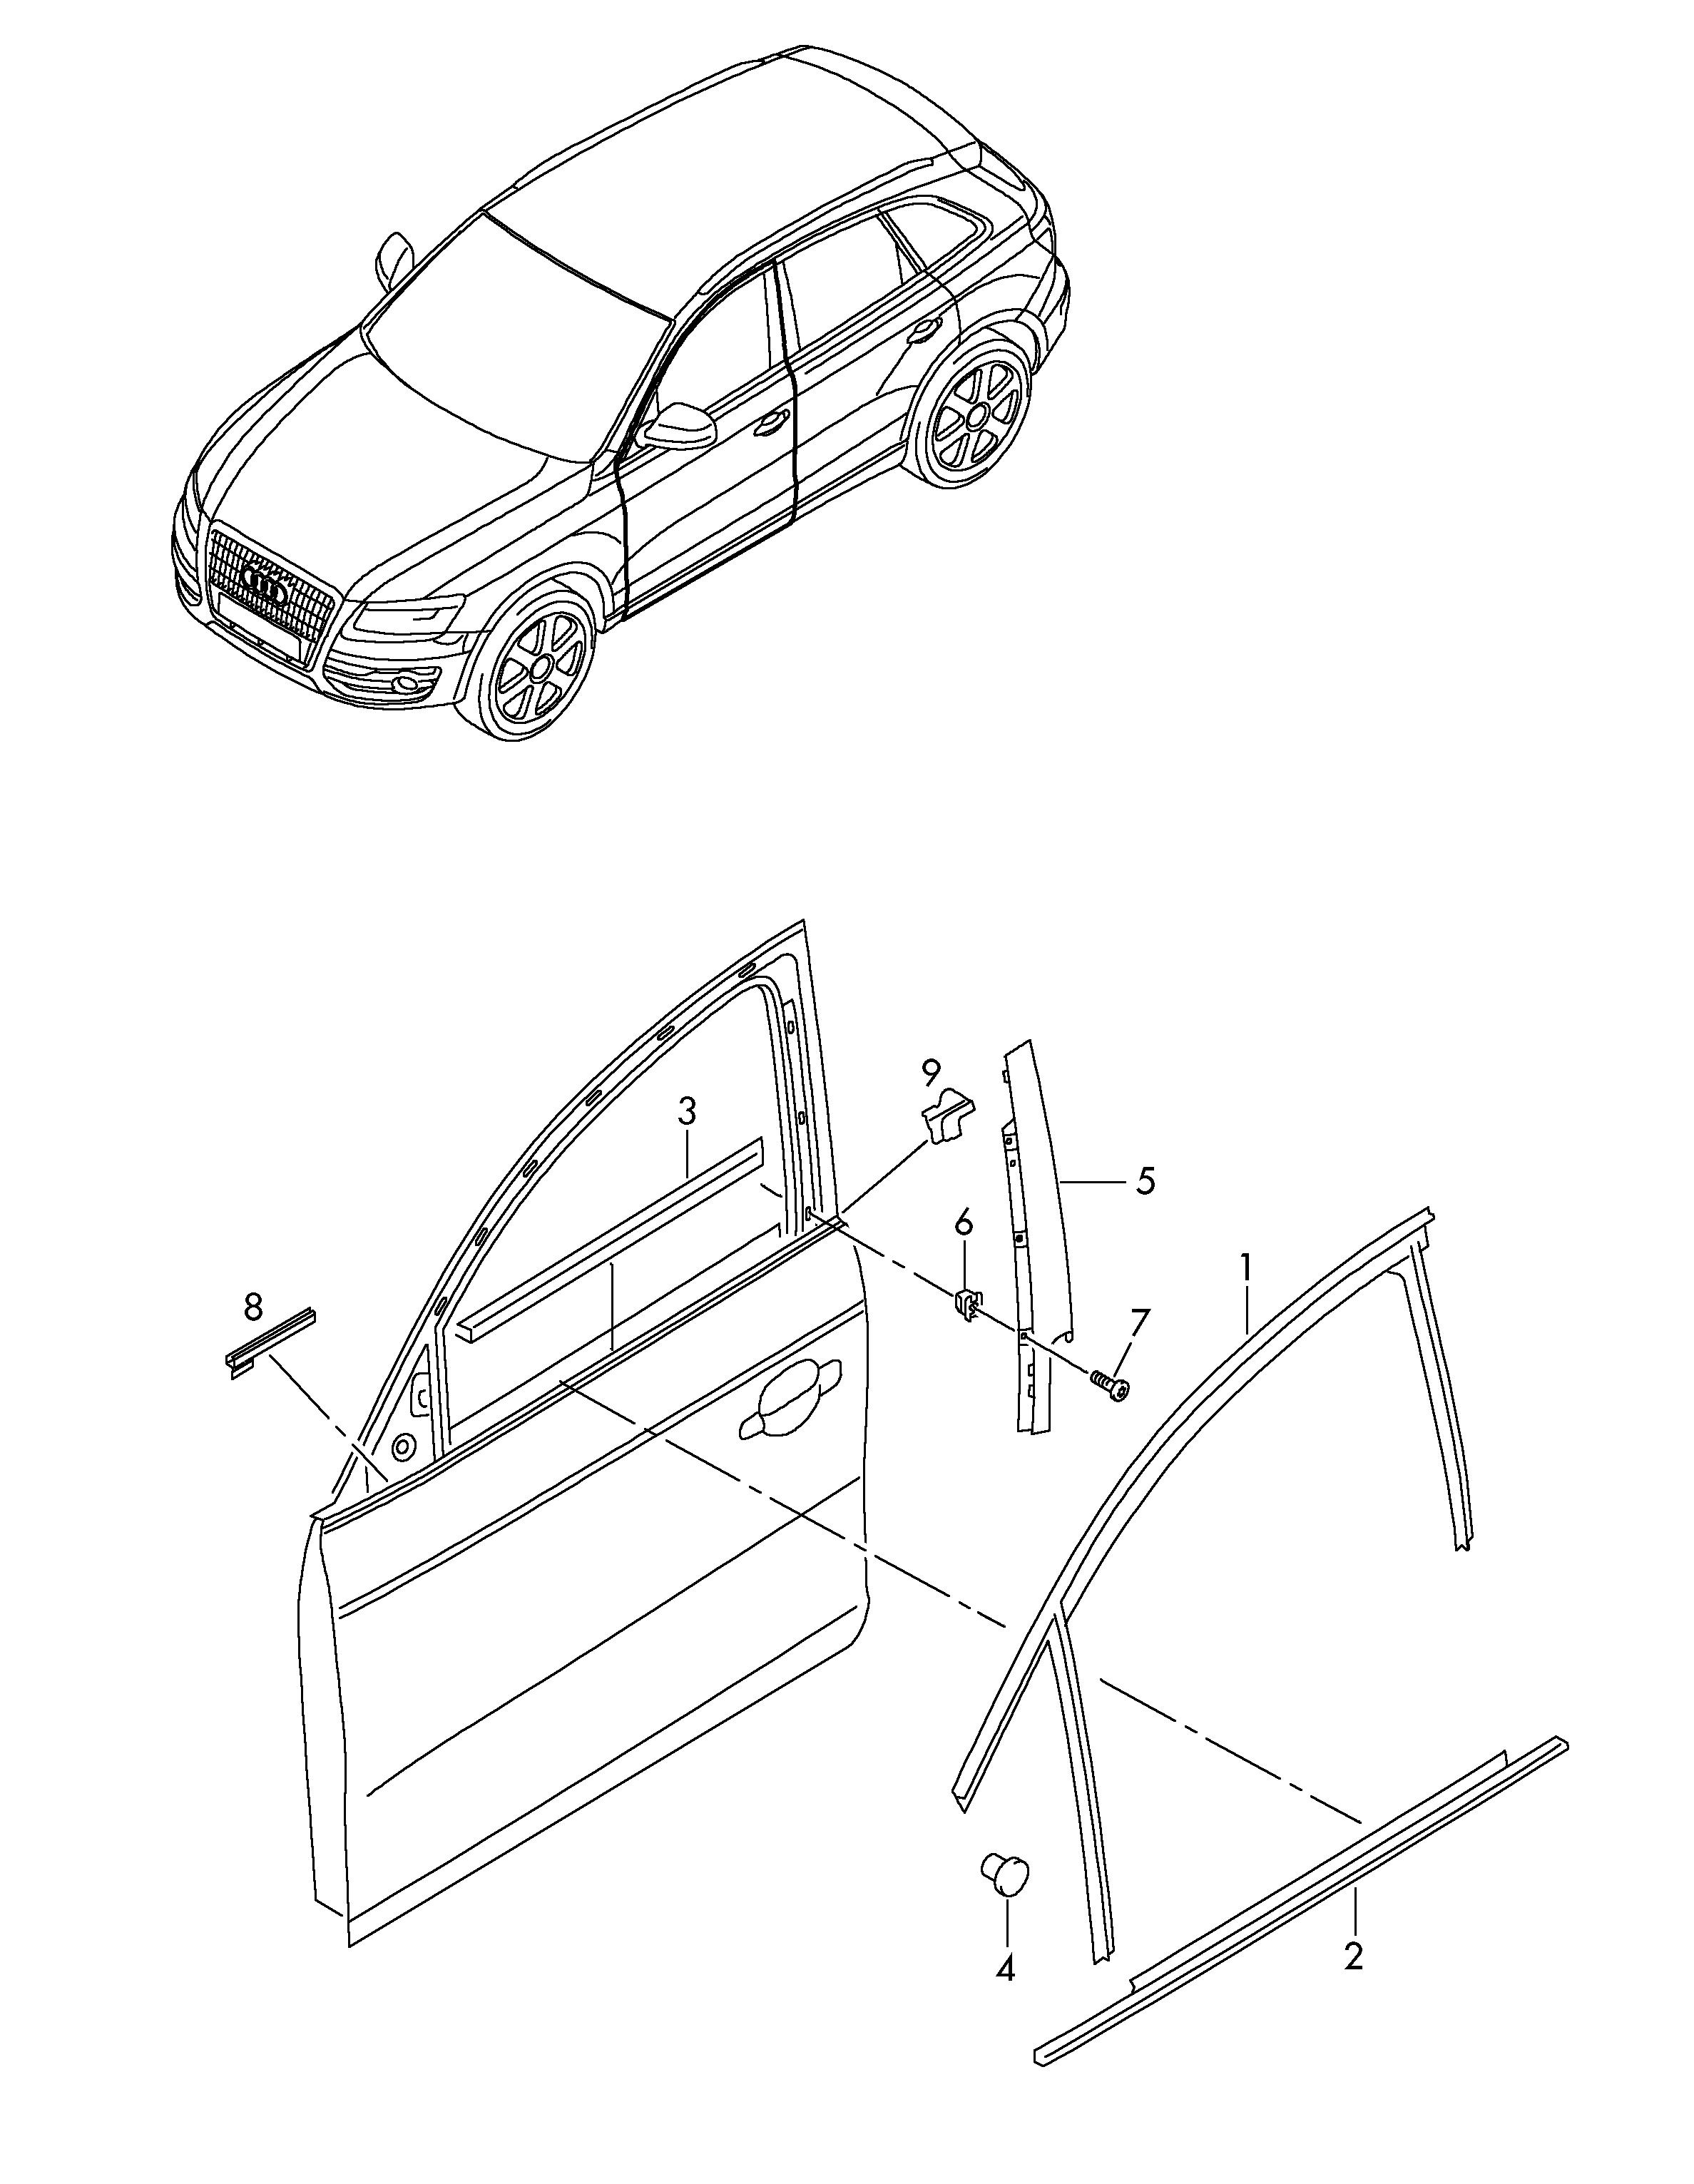 Audi Q5 (2013 - 2017) - trim for pillar b  window guide